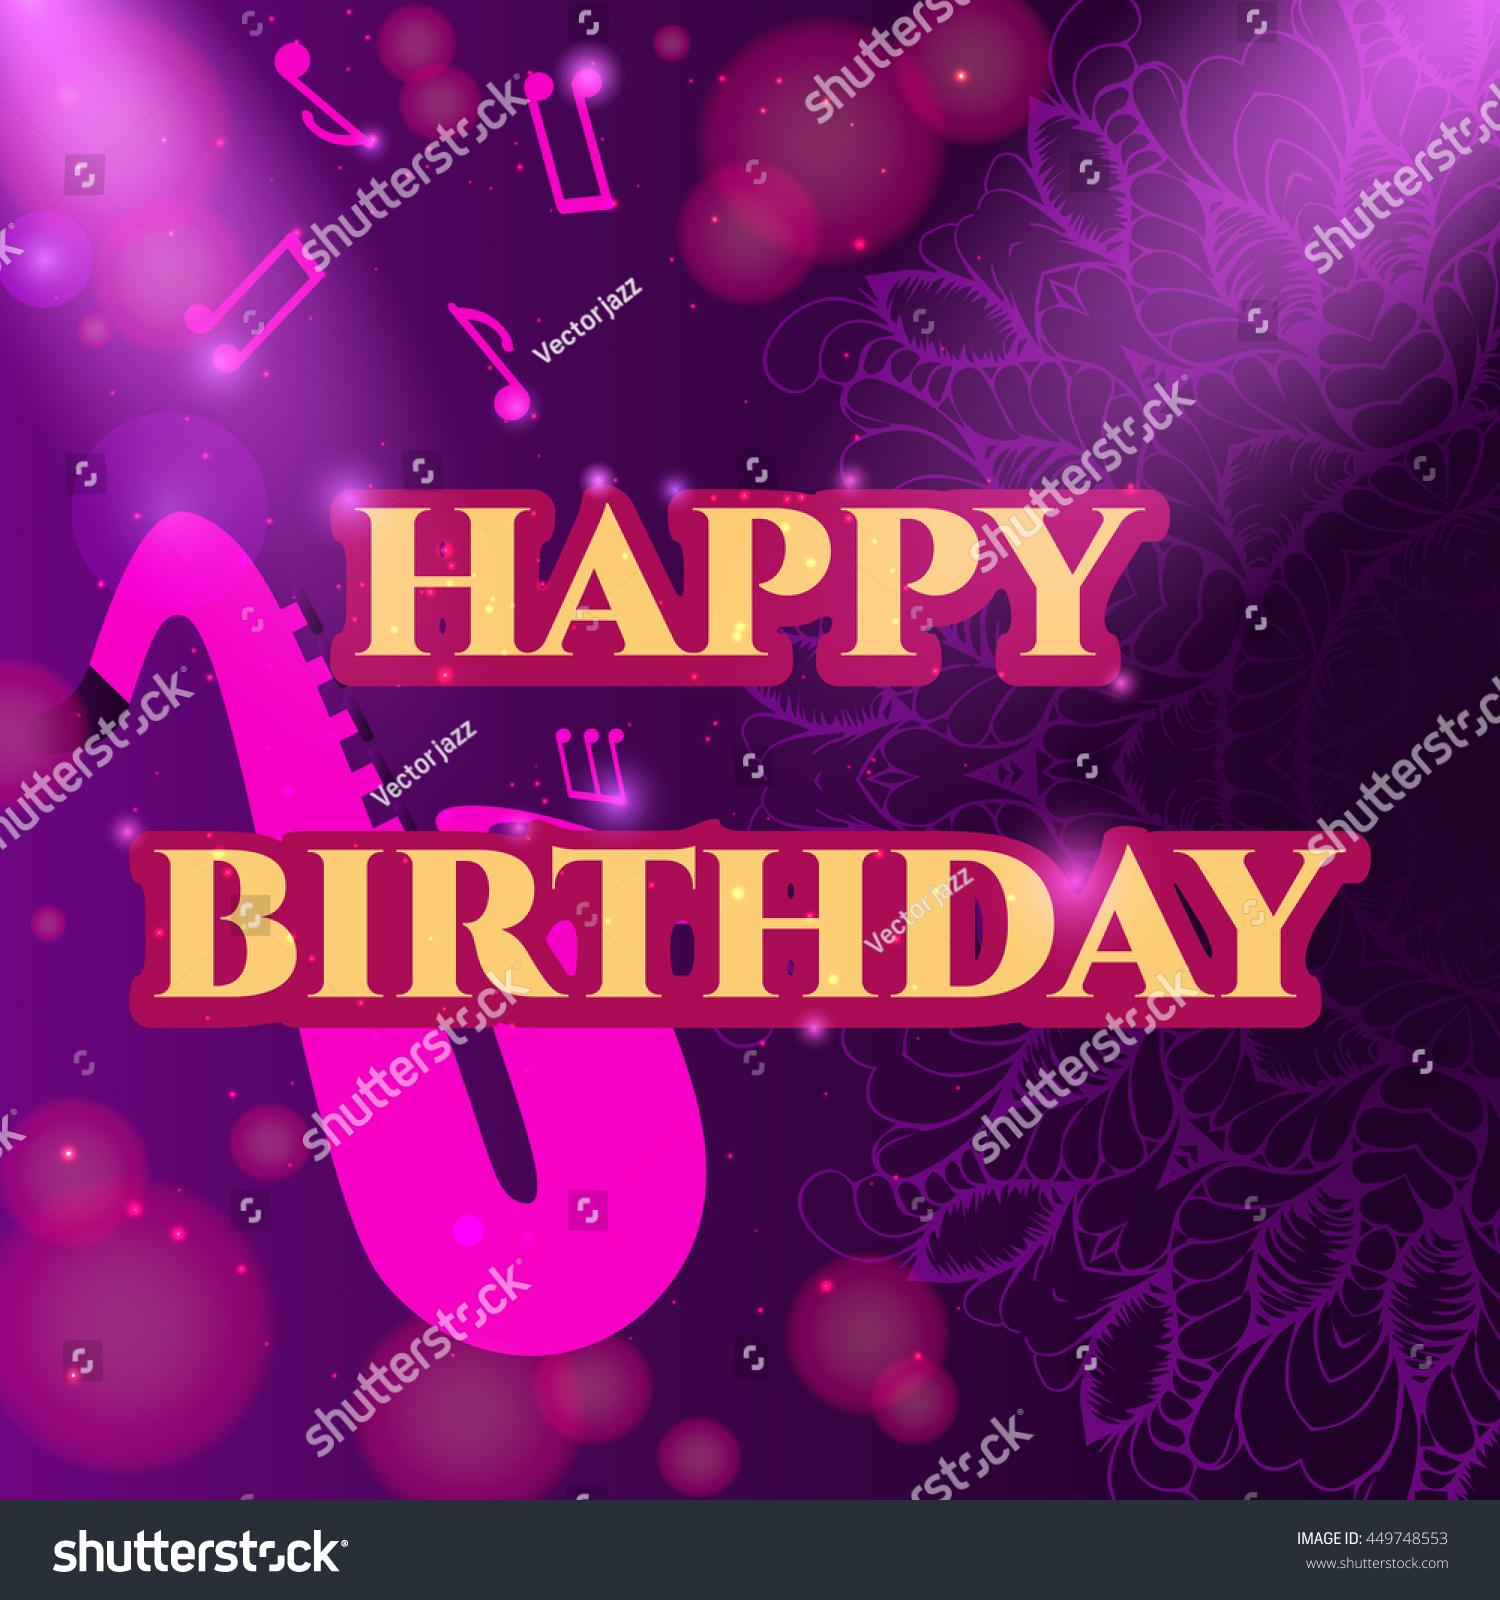 Greeting Card Happy Birthday Abstract Mandala Decorated Element Music Stylish Inscription